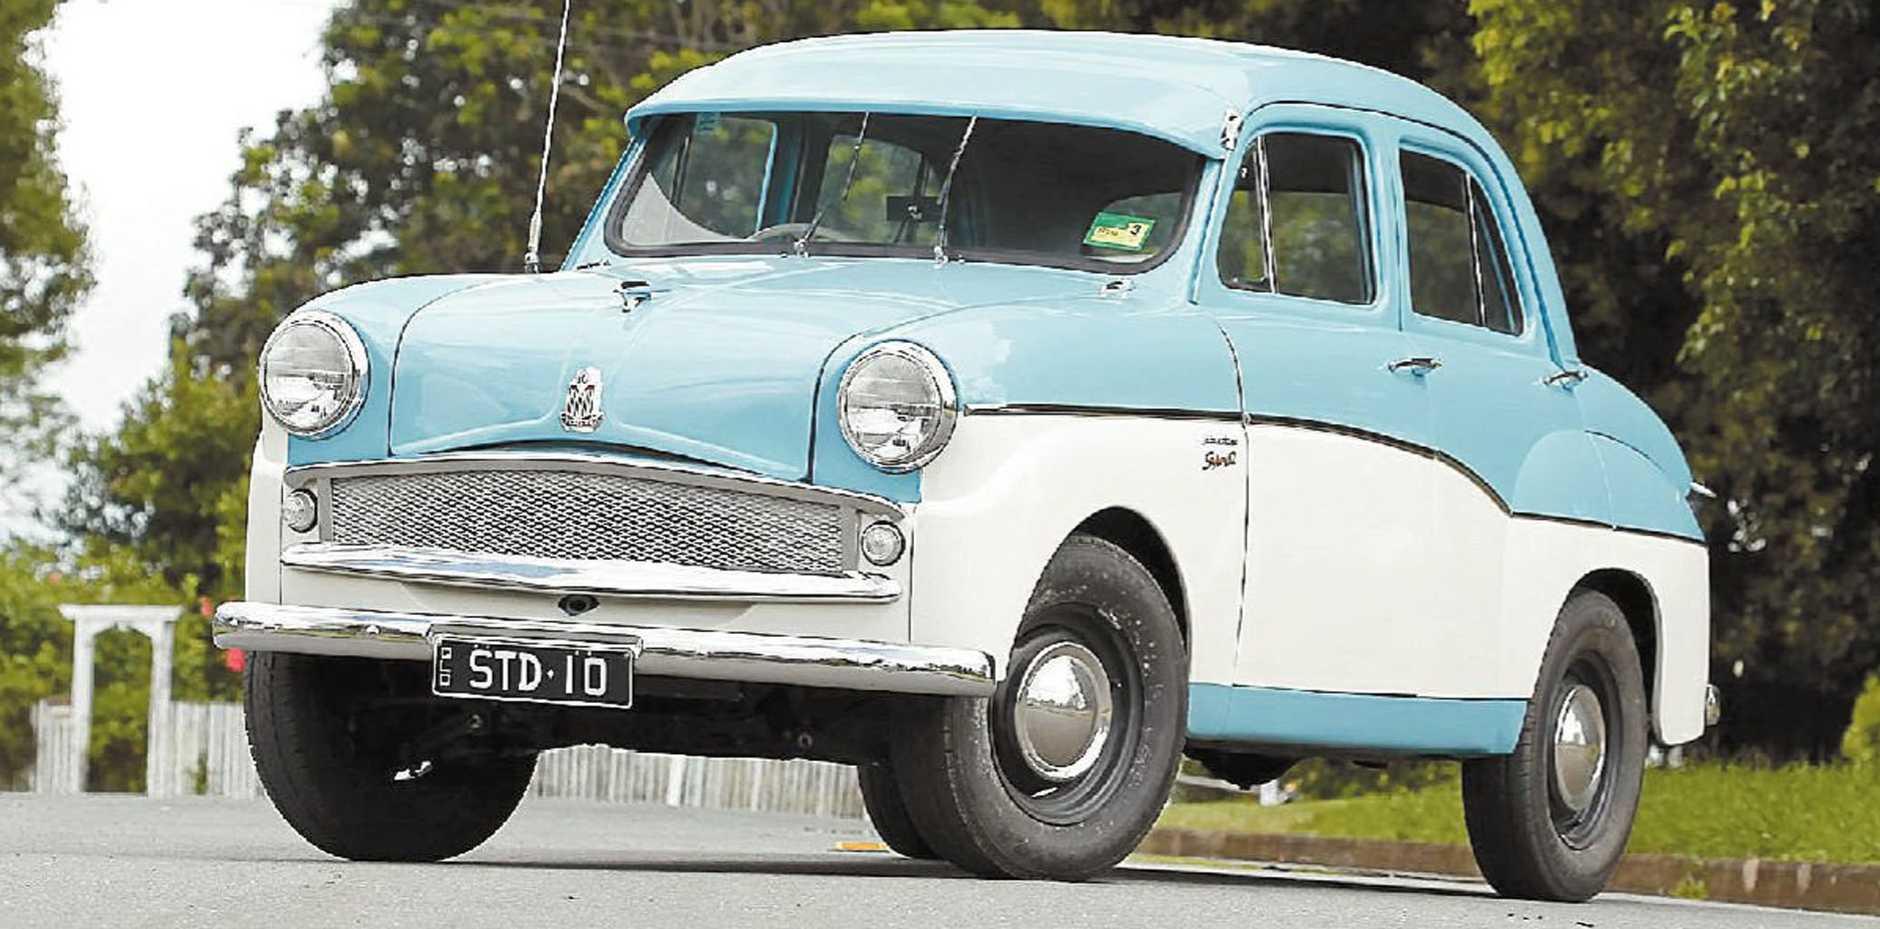 Dennis Douglas' fully reconstructed 1954 Super Standard 10